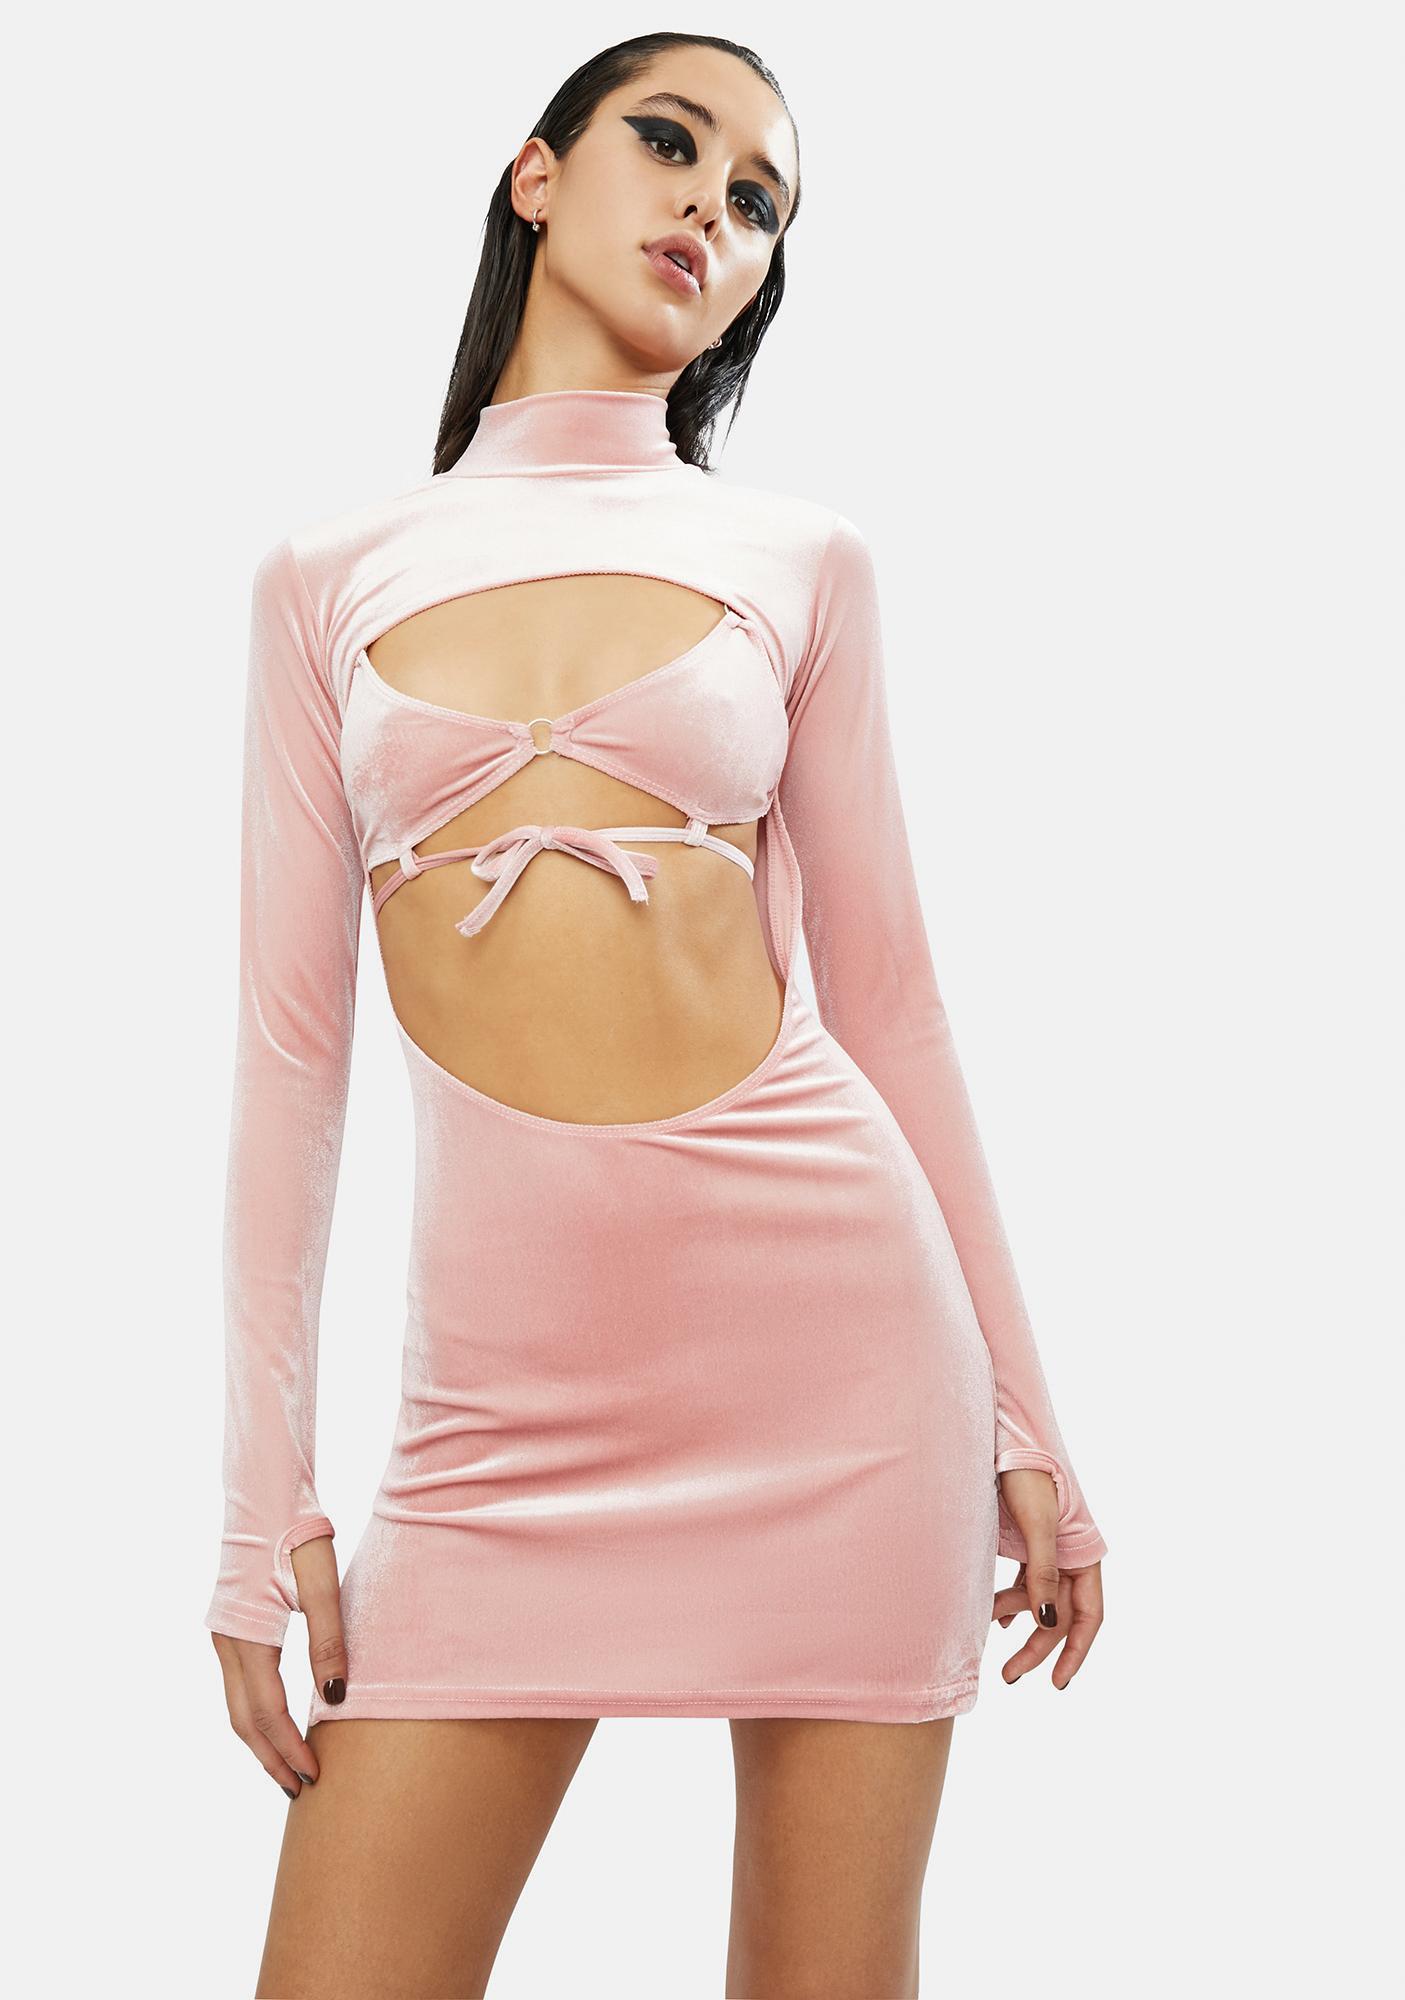 Club Exx Rave Bunny Velvet Cut-Out Dress